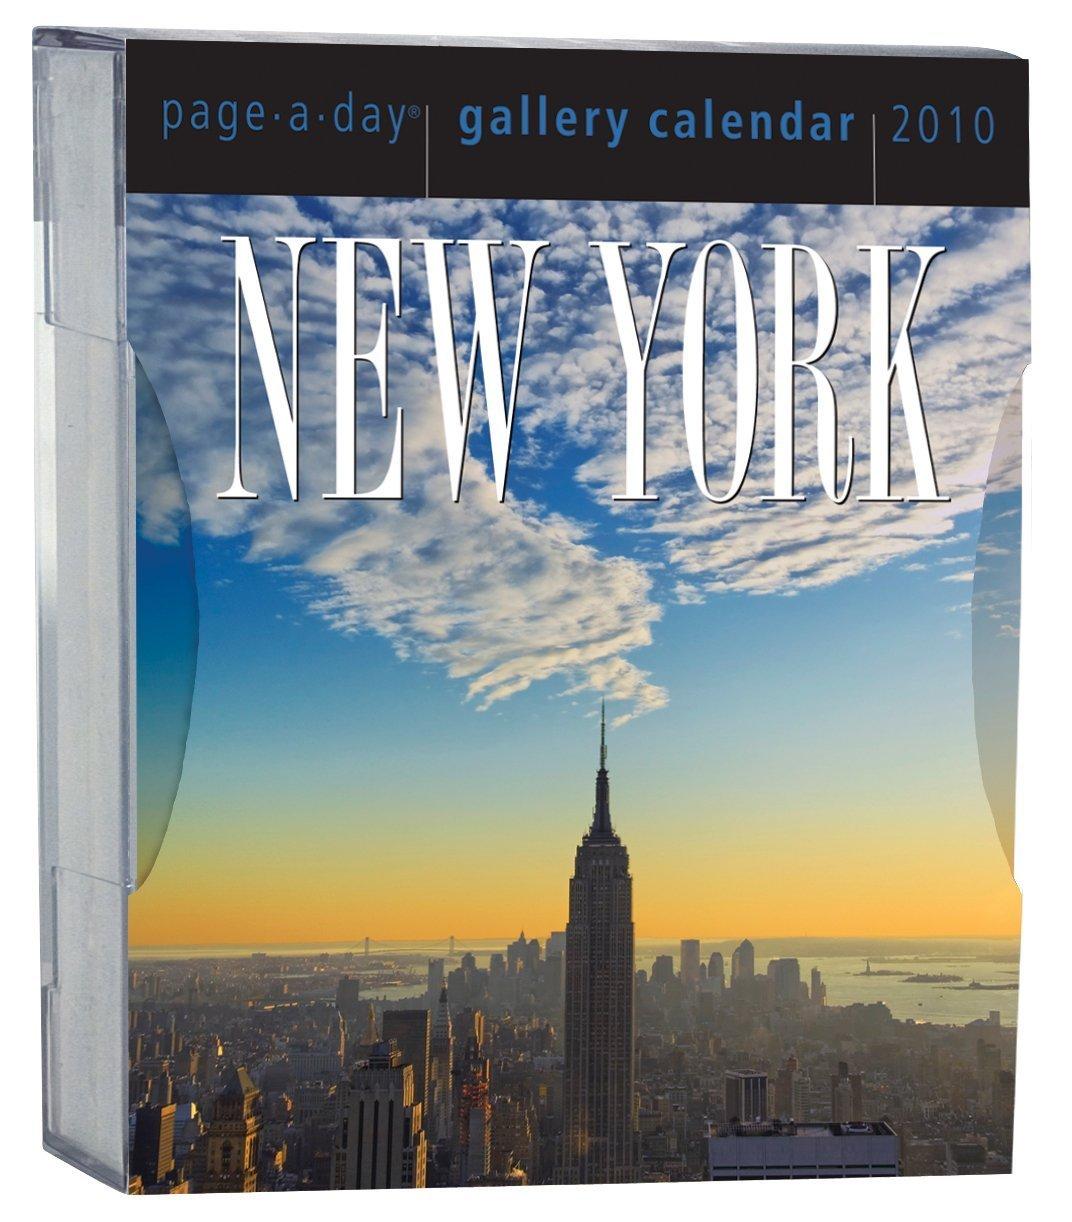 New York Gallery Calendar 2010 Text fb2 ebook